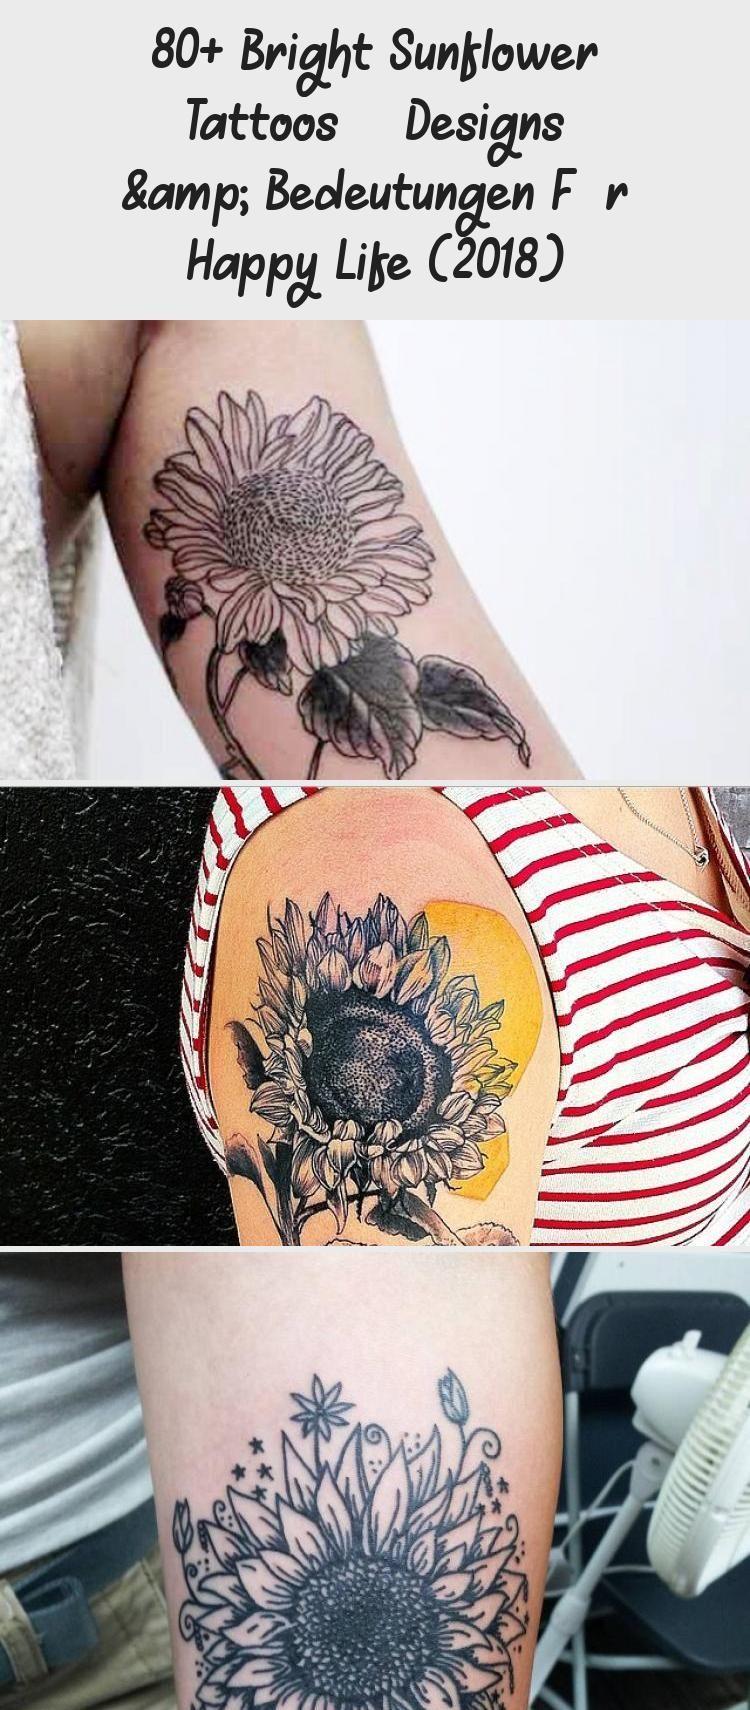 32+ Best Sunflower meaning tattoo designs ideas